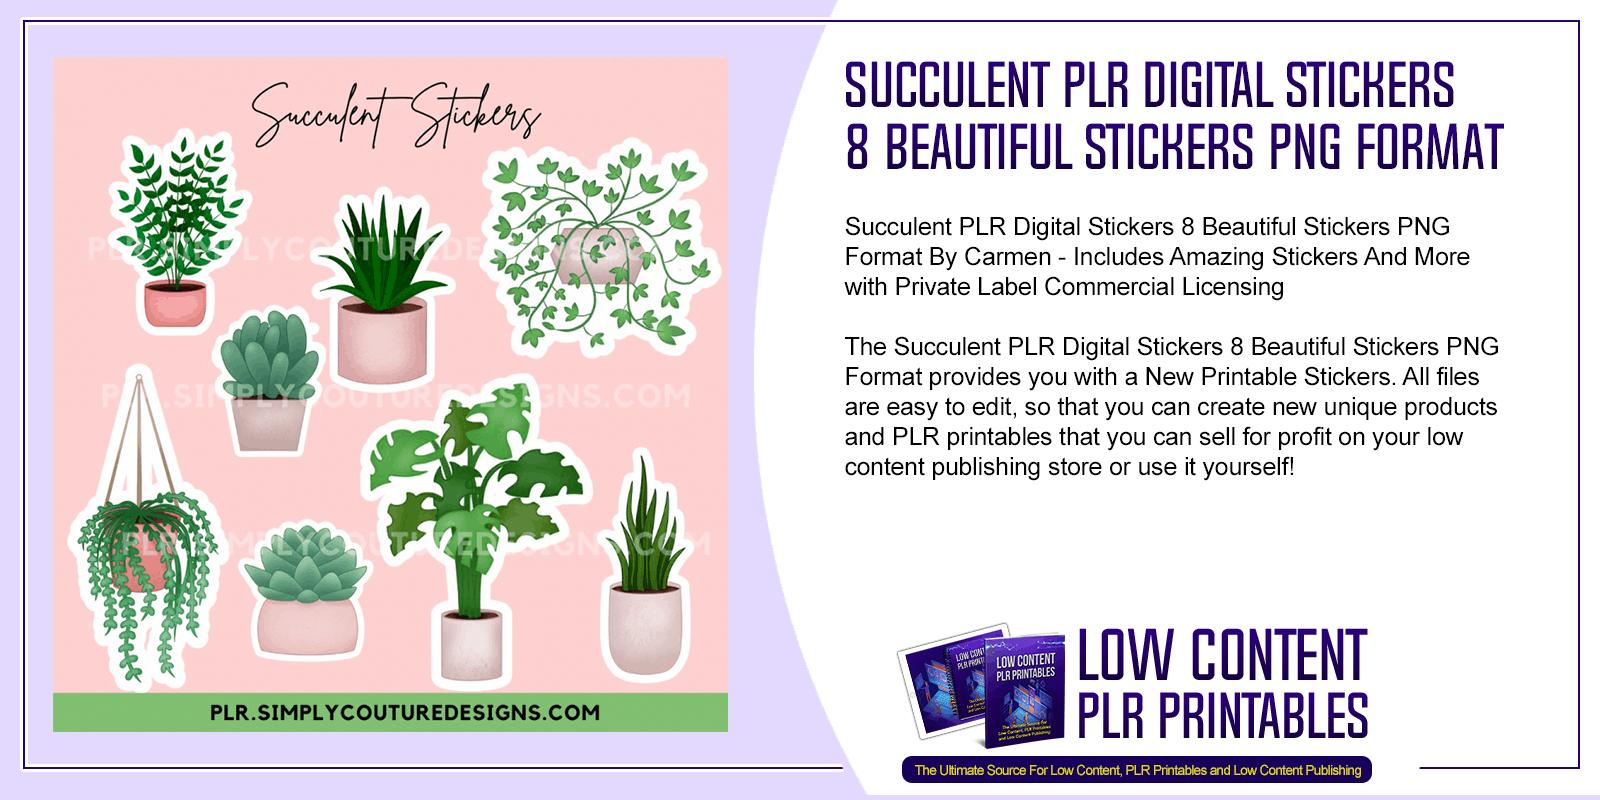 Succulent PLR Digital Stickers 8 Beautiful Stickers PNG Format